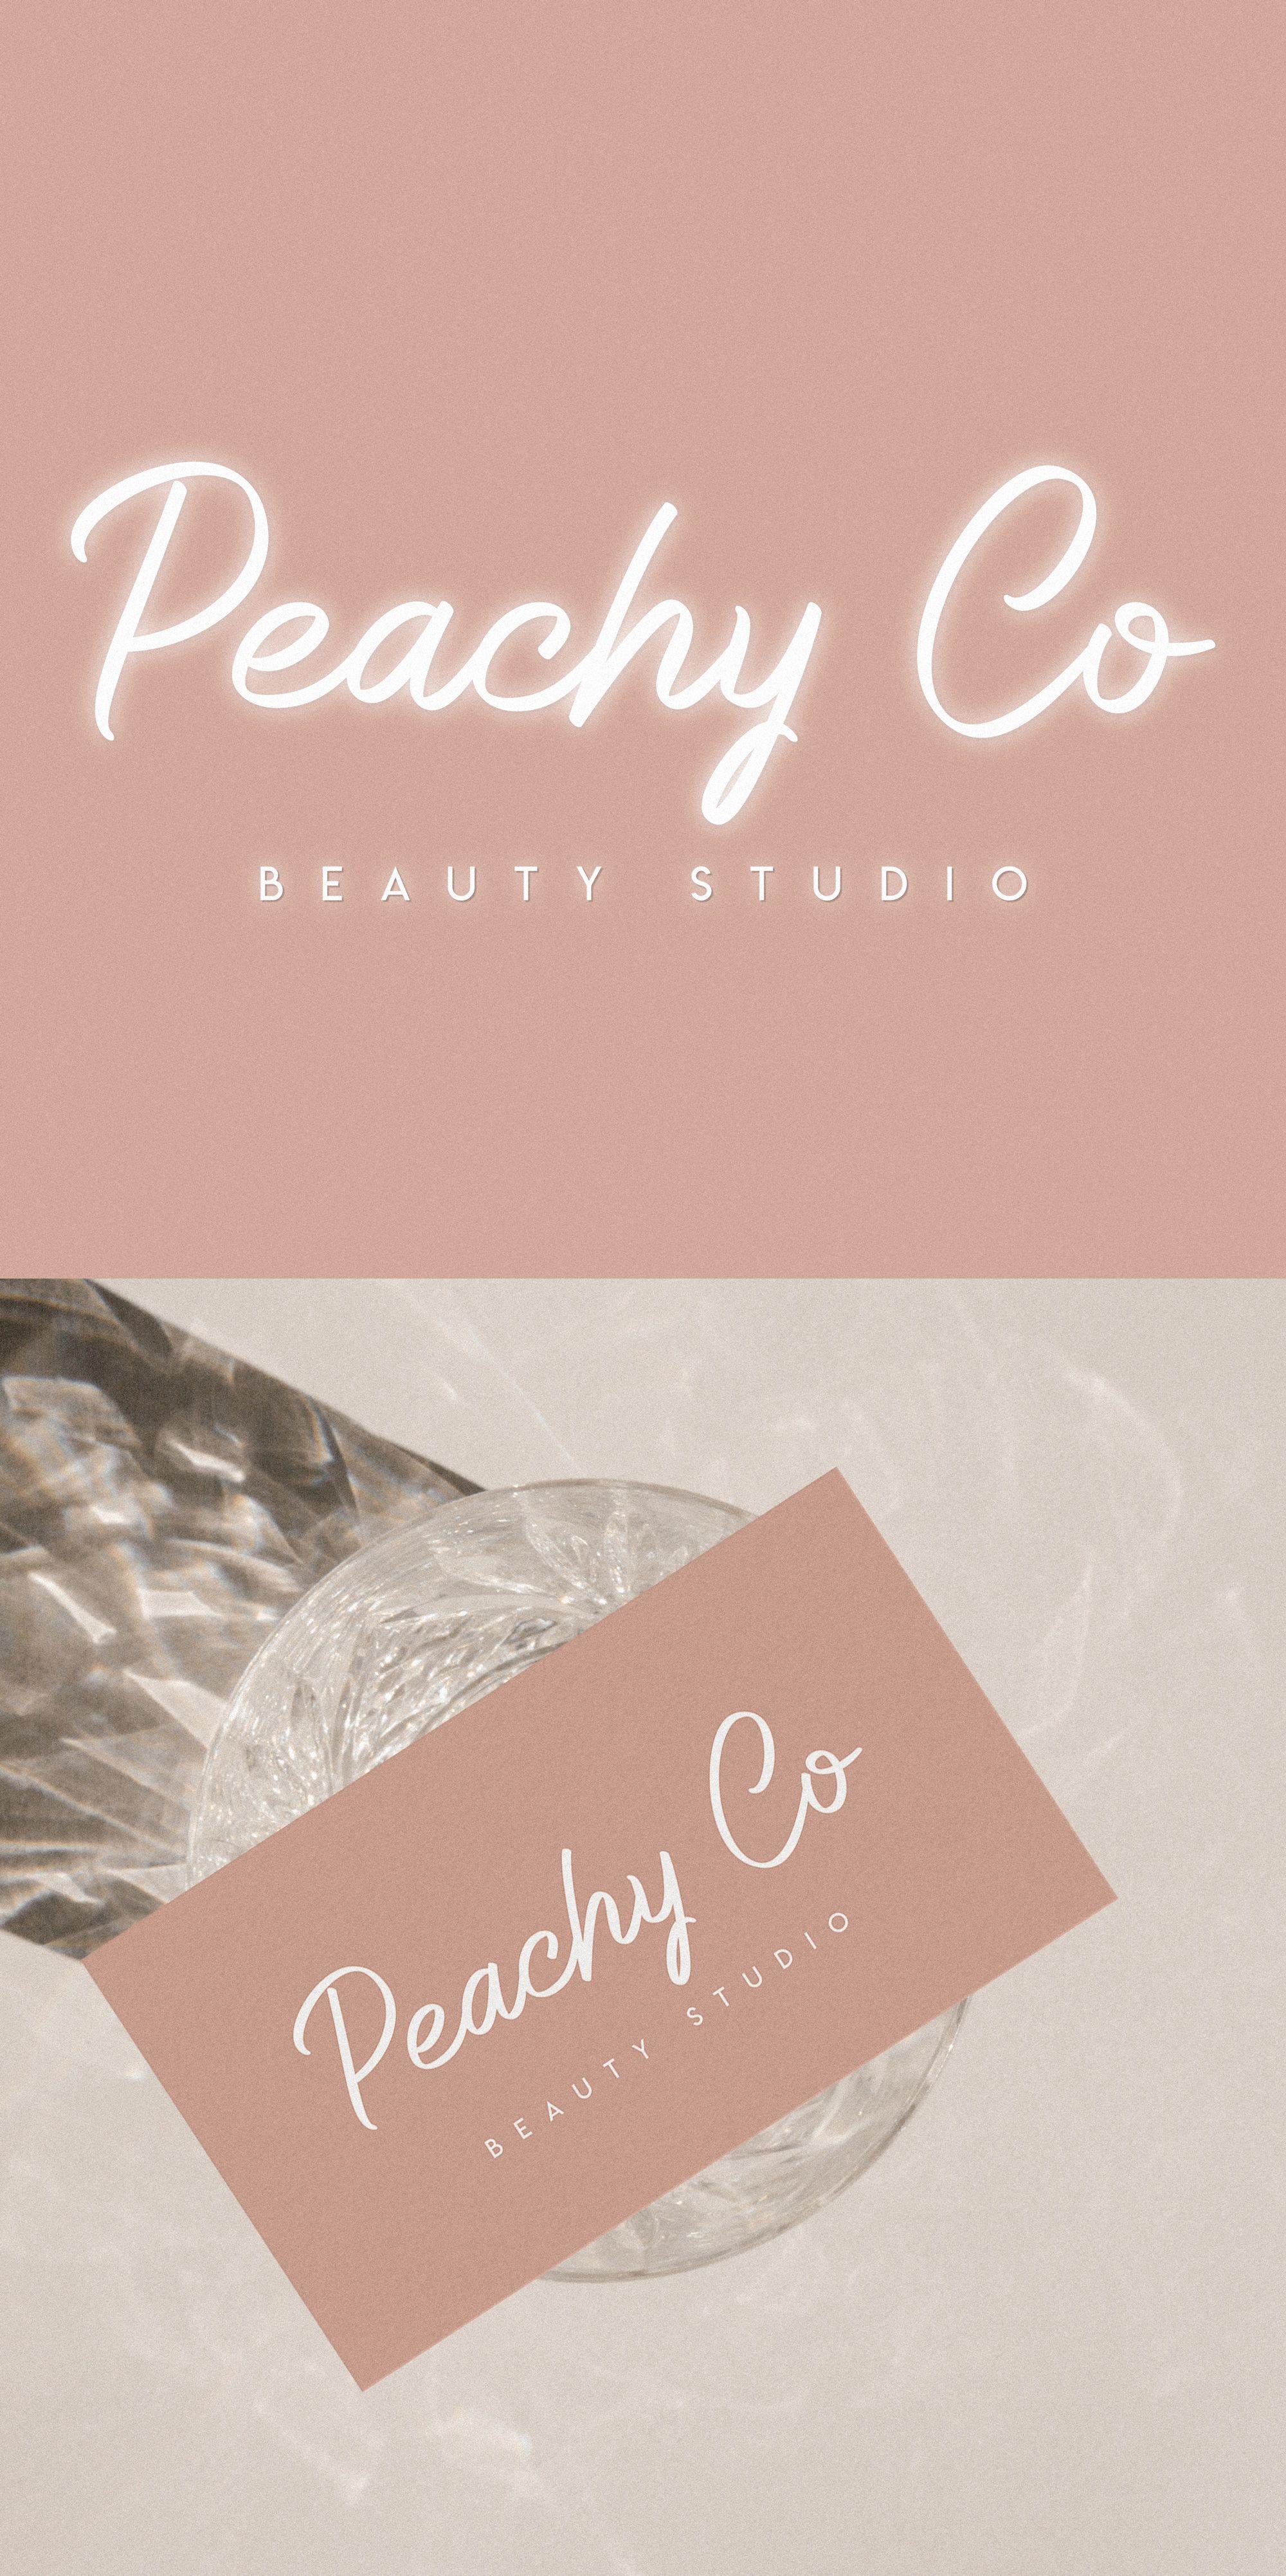 Premade Neon Logo, Beauty Logo Design, White Neon Letters